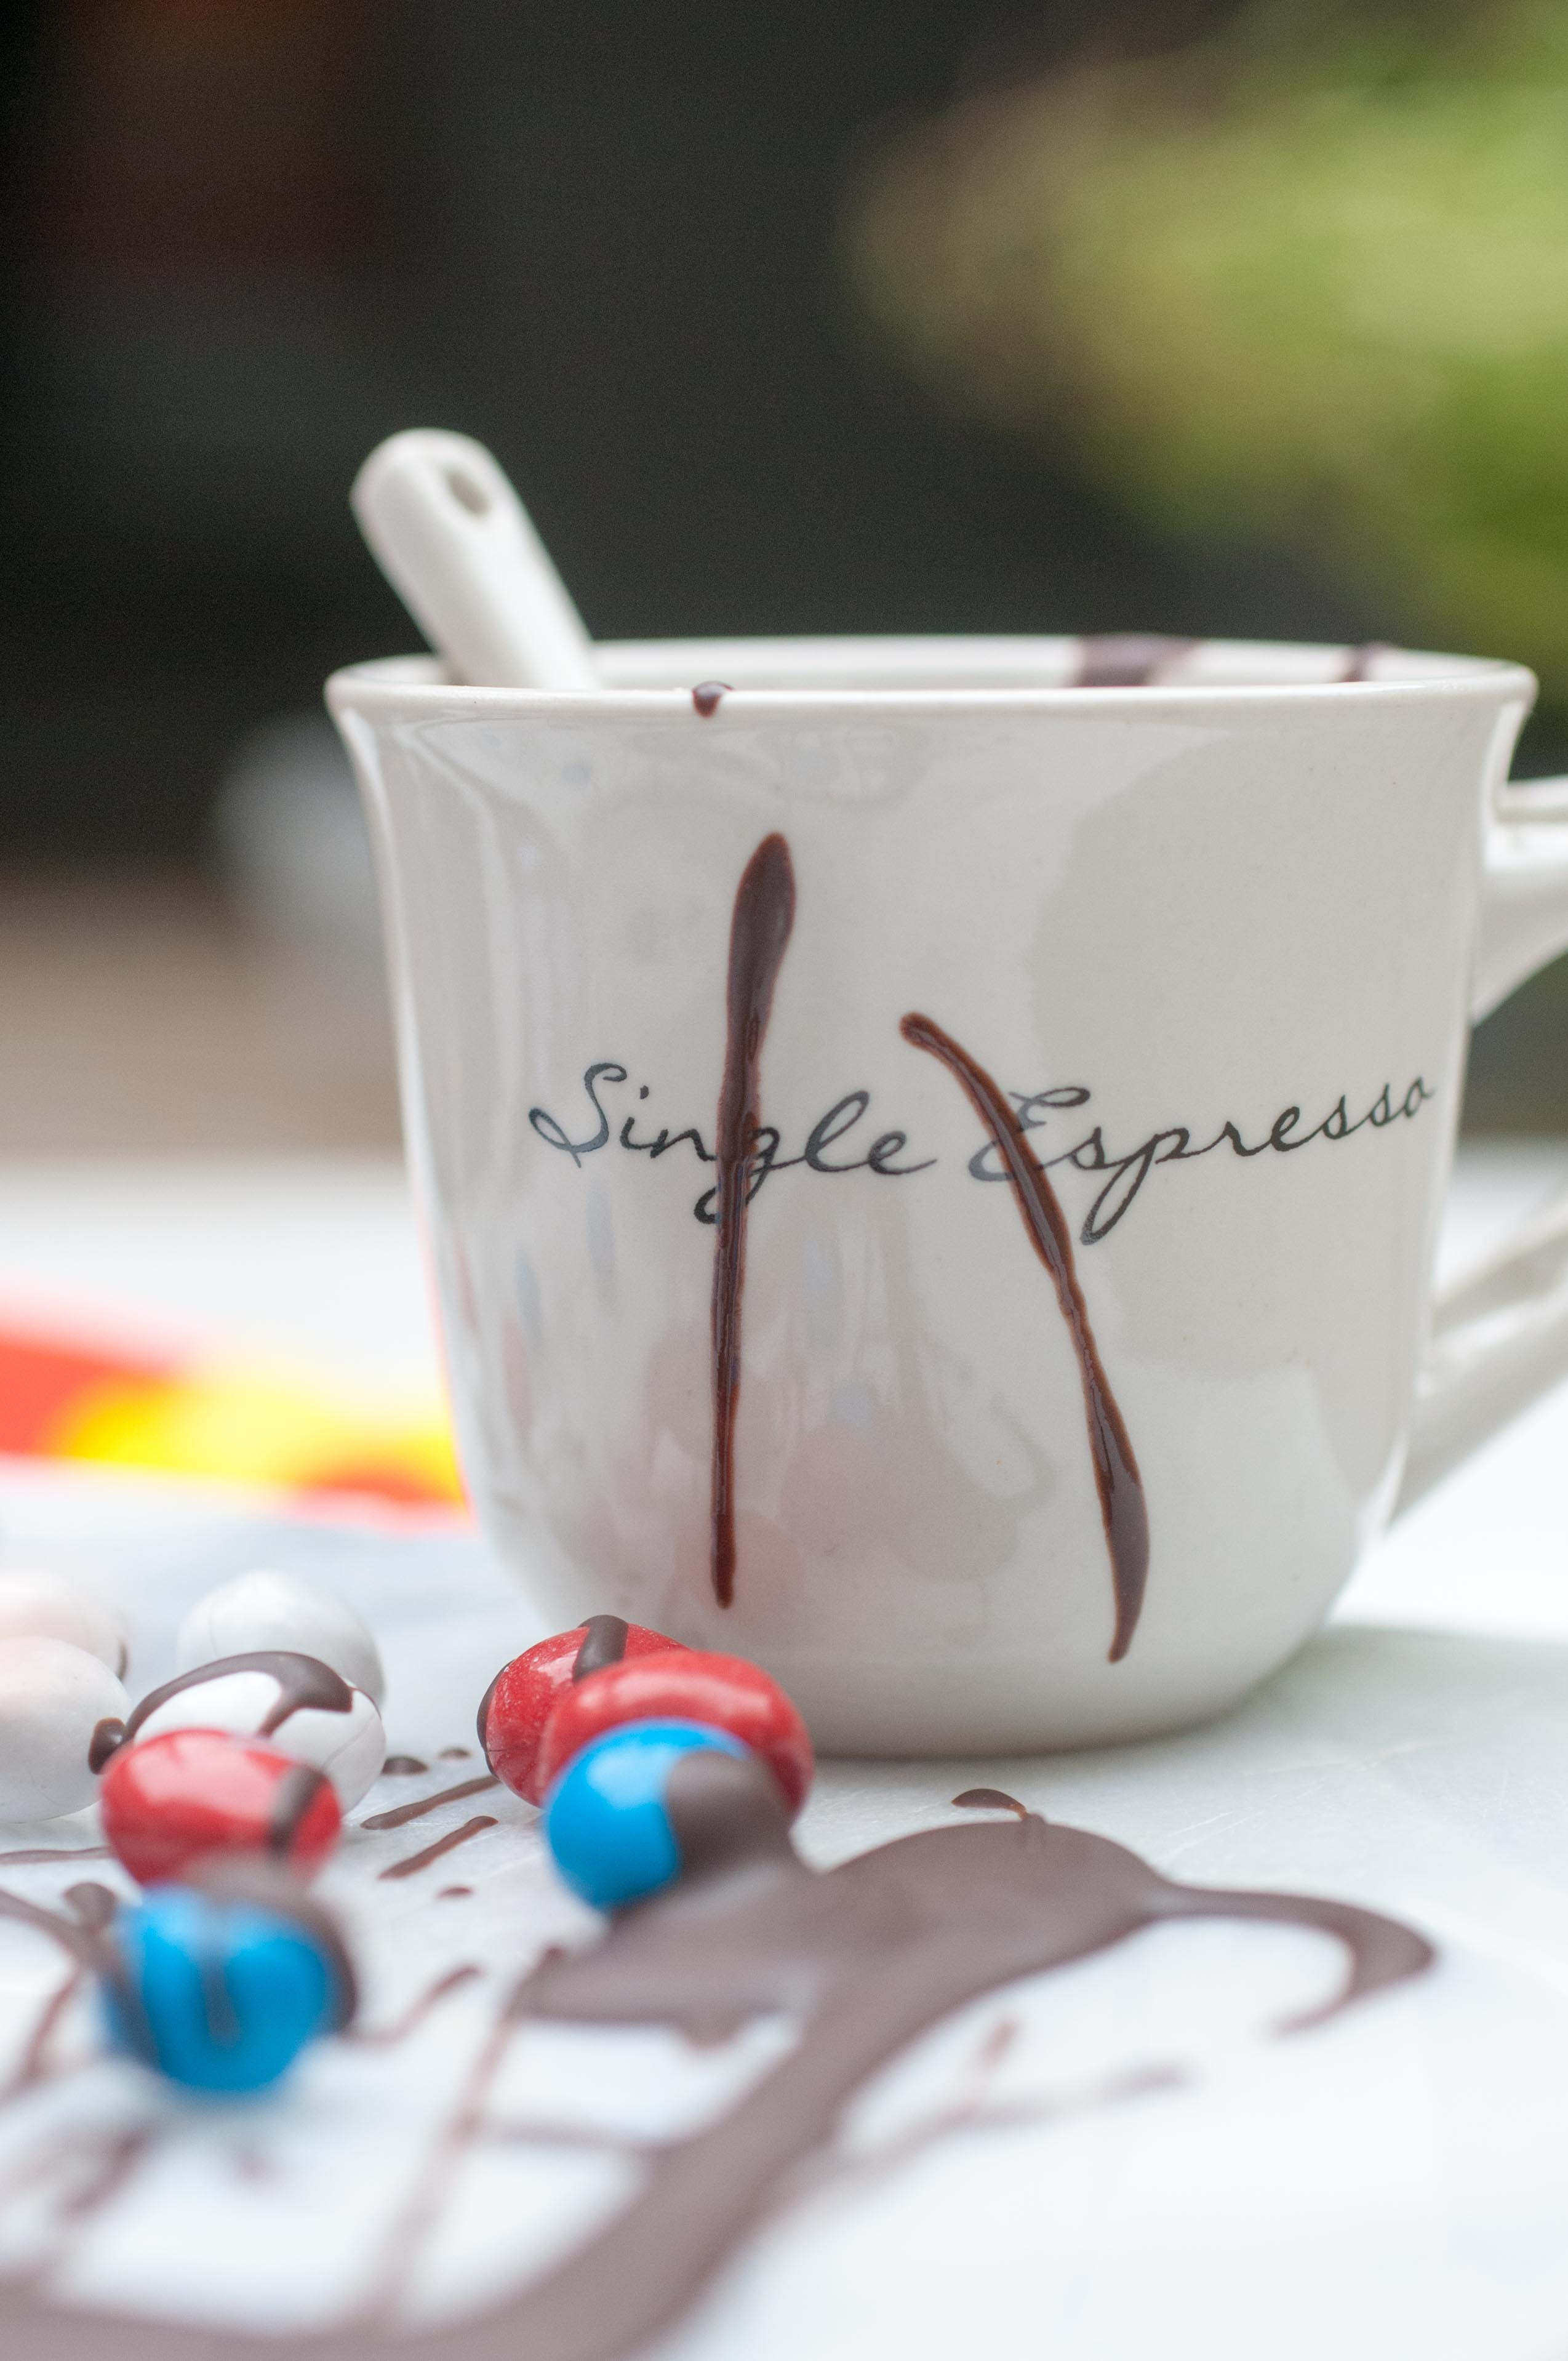 Espressotasse mit Schokolade